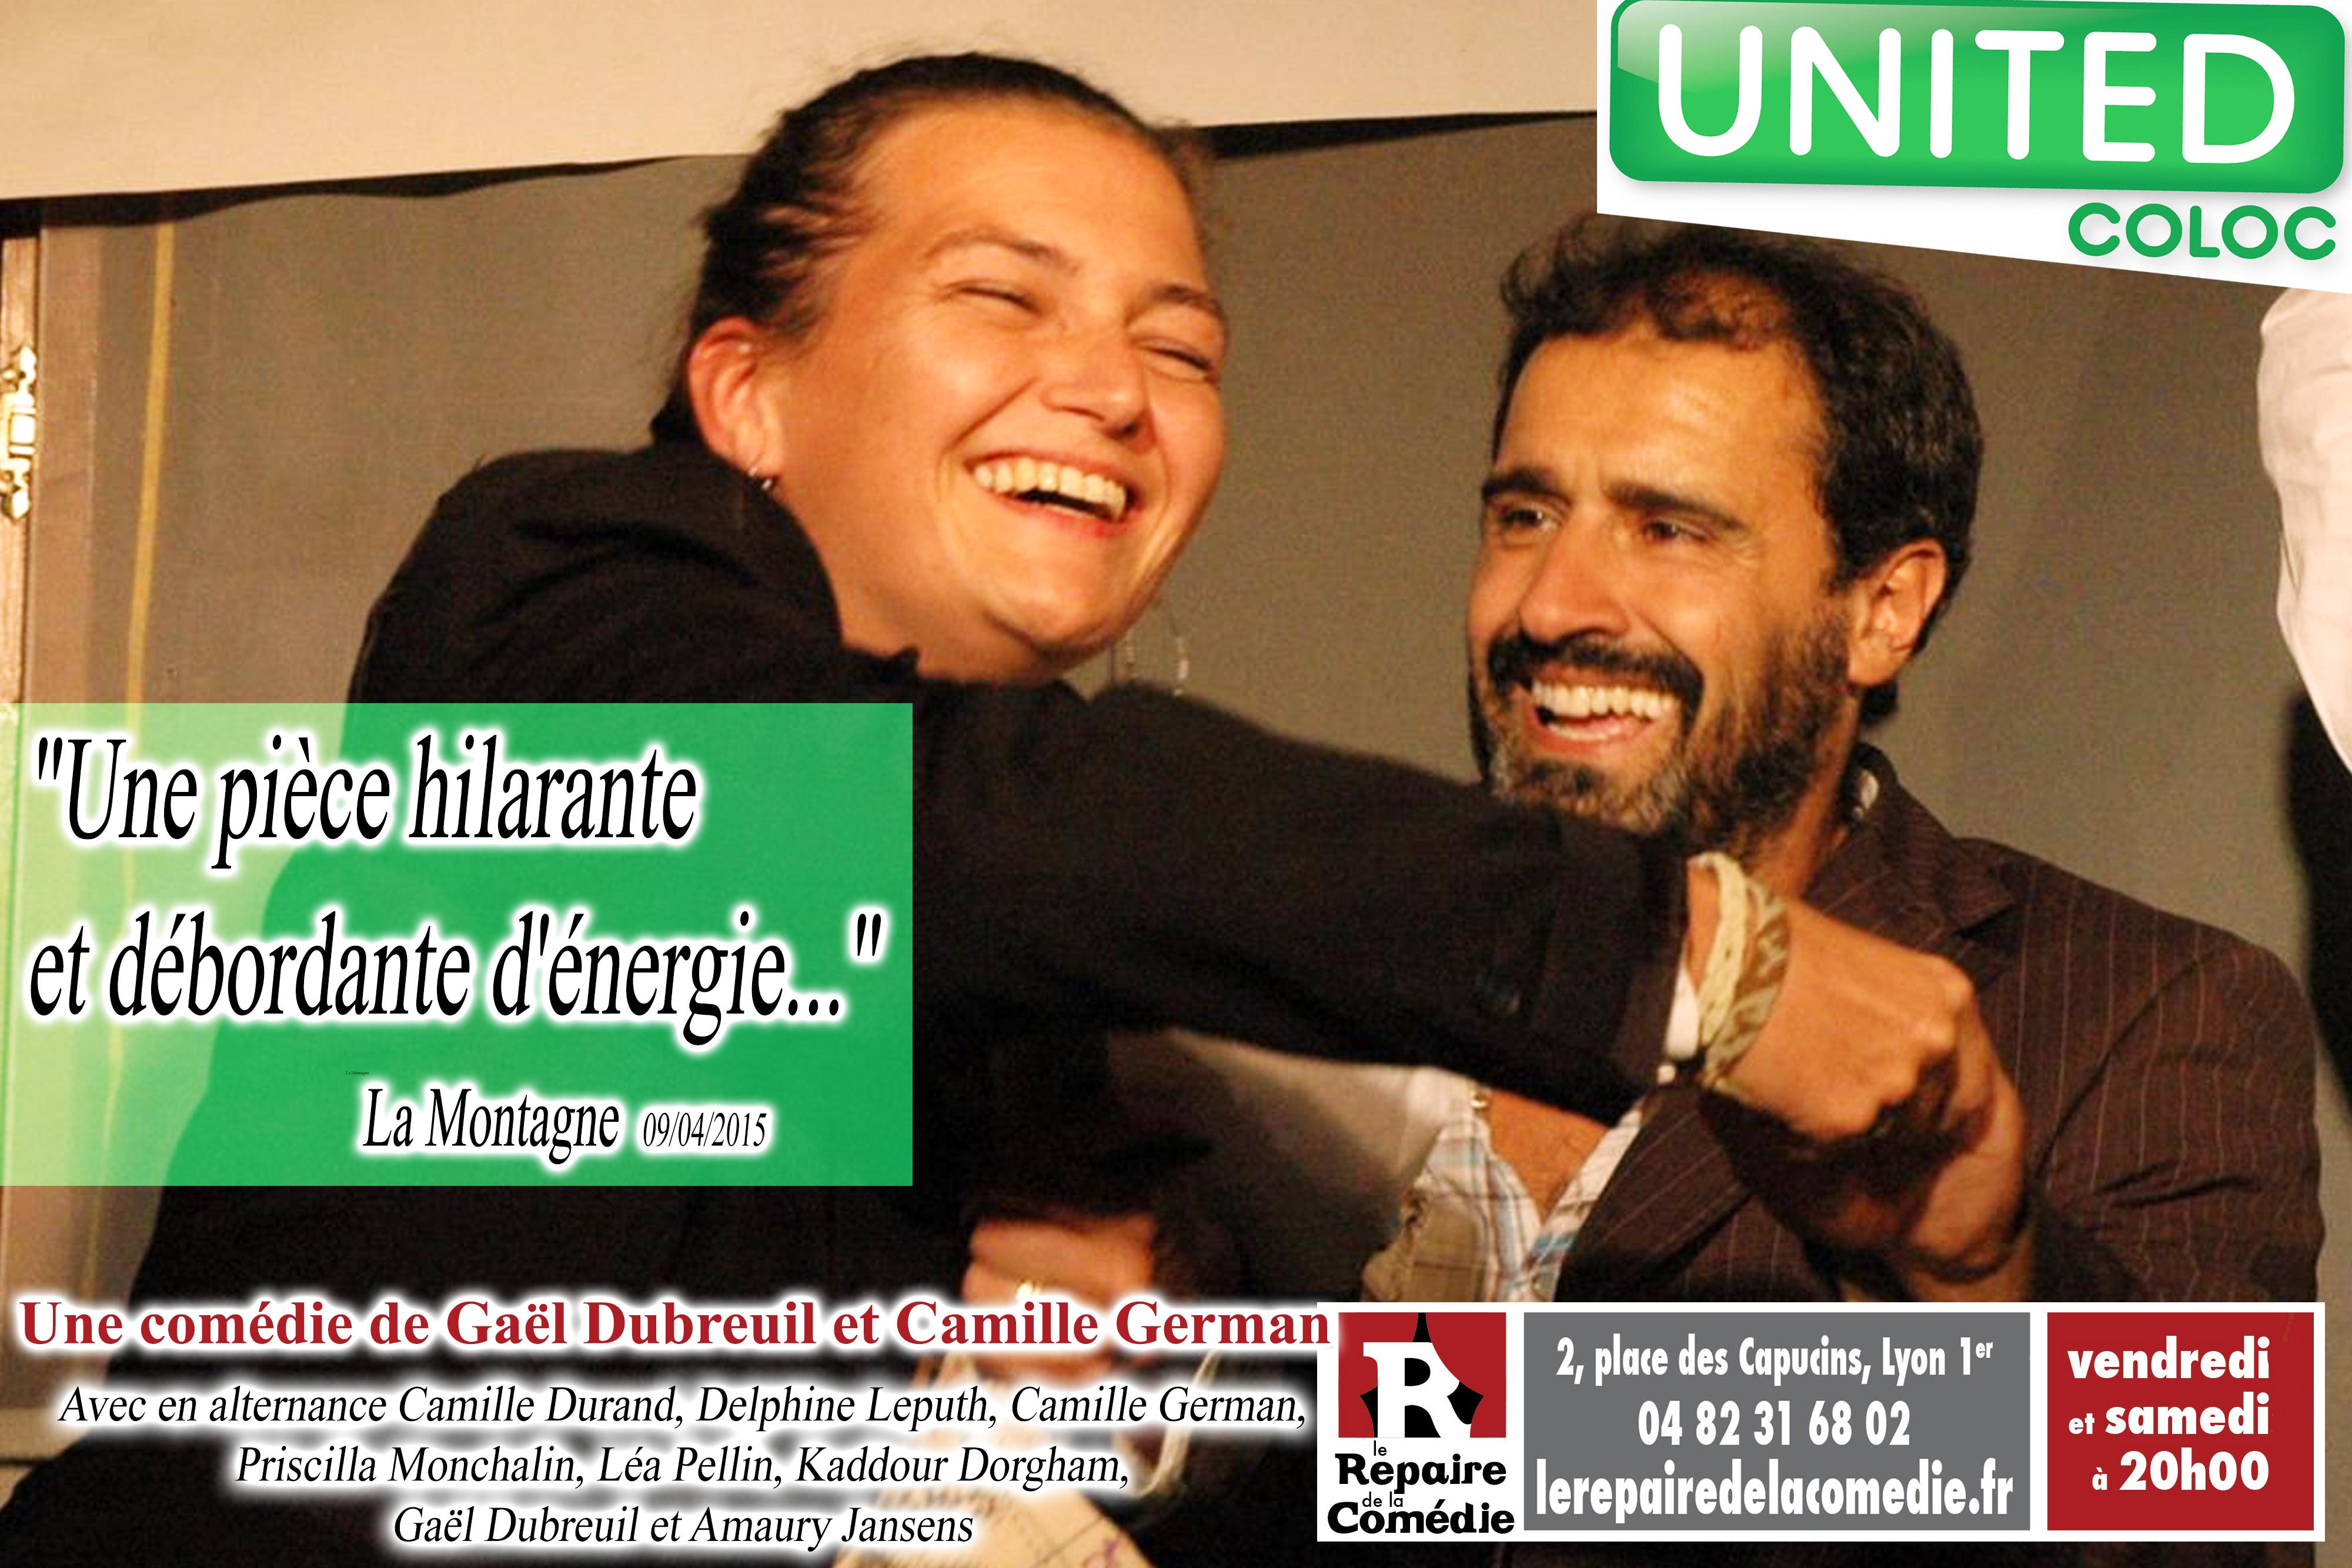 united coloc la montagne